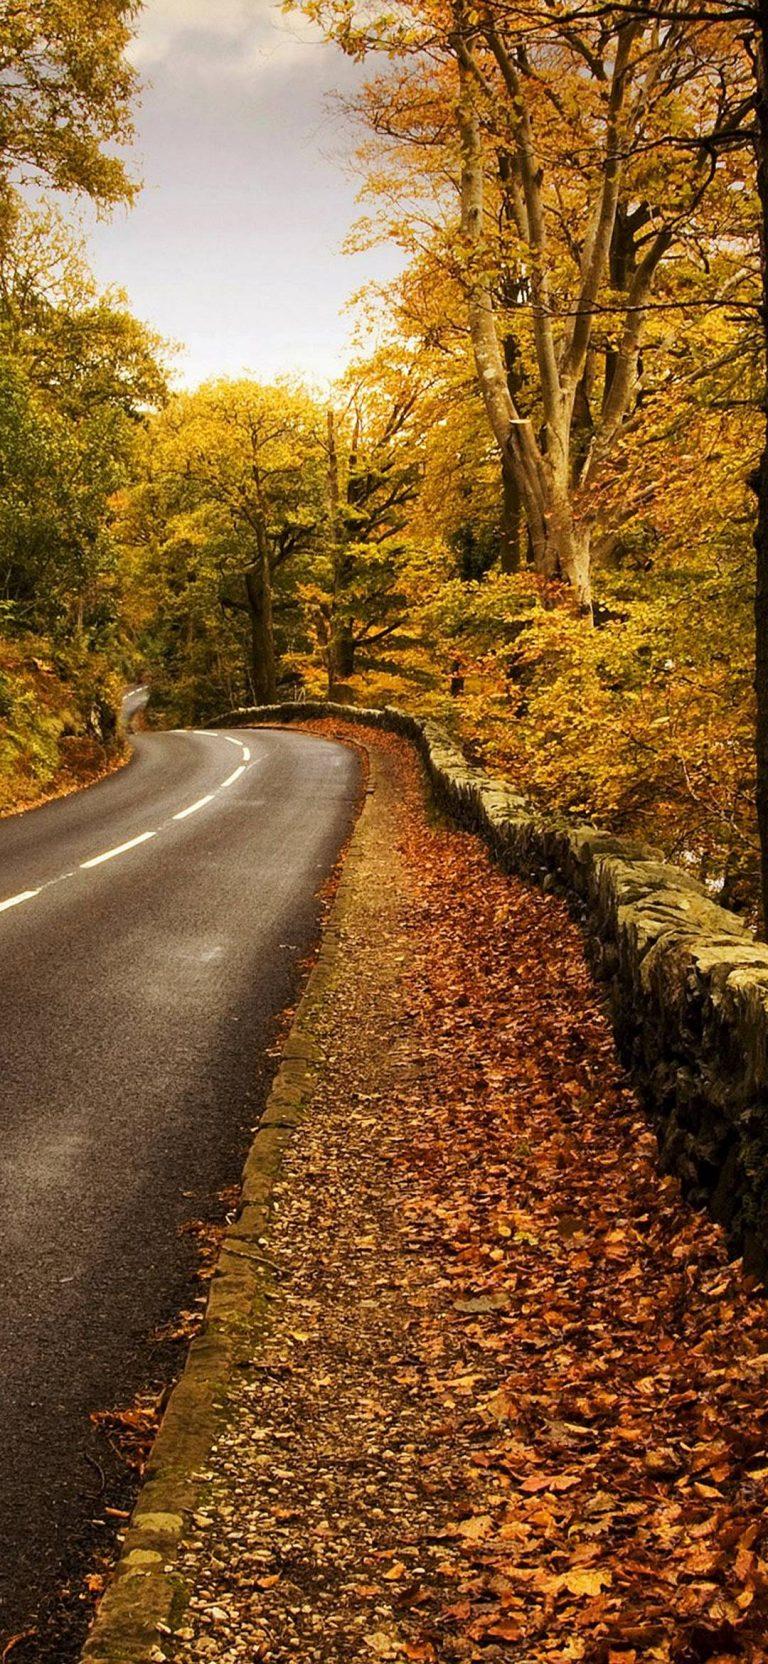 Autumn Road Wallpaper 1080x2340 768x1664